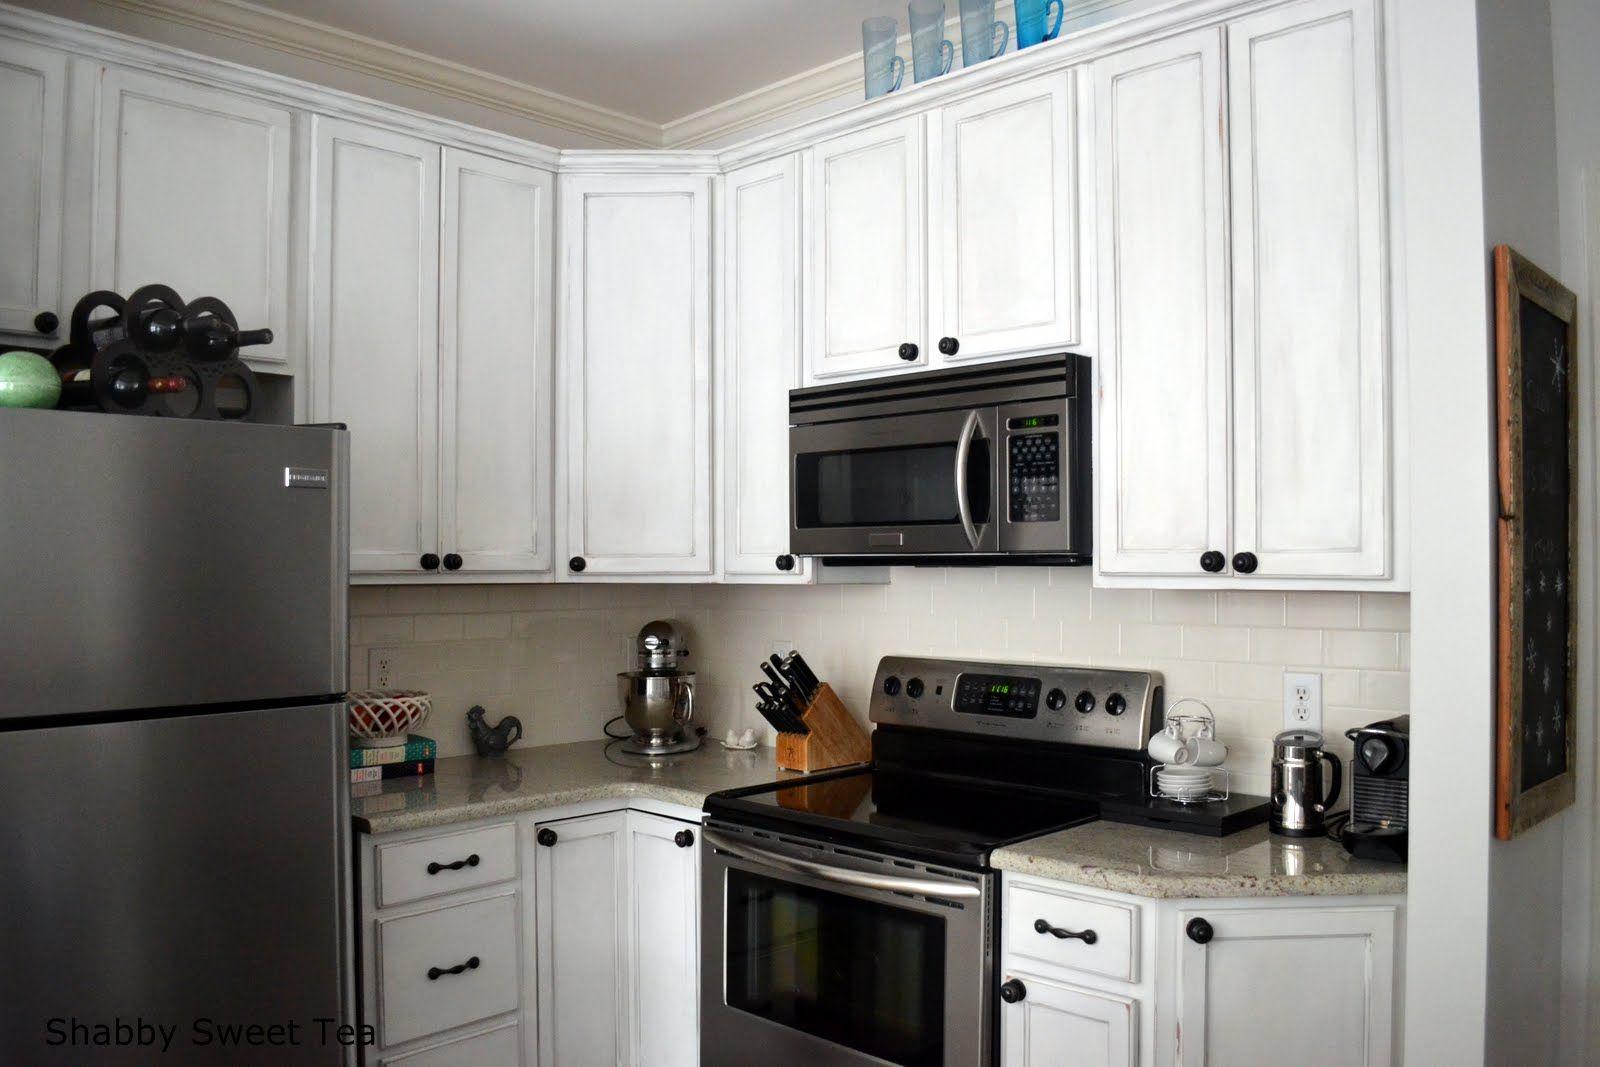 Pin by Heidi Goff on kitchen cabinets | Pinterest | Chalk paint ...